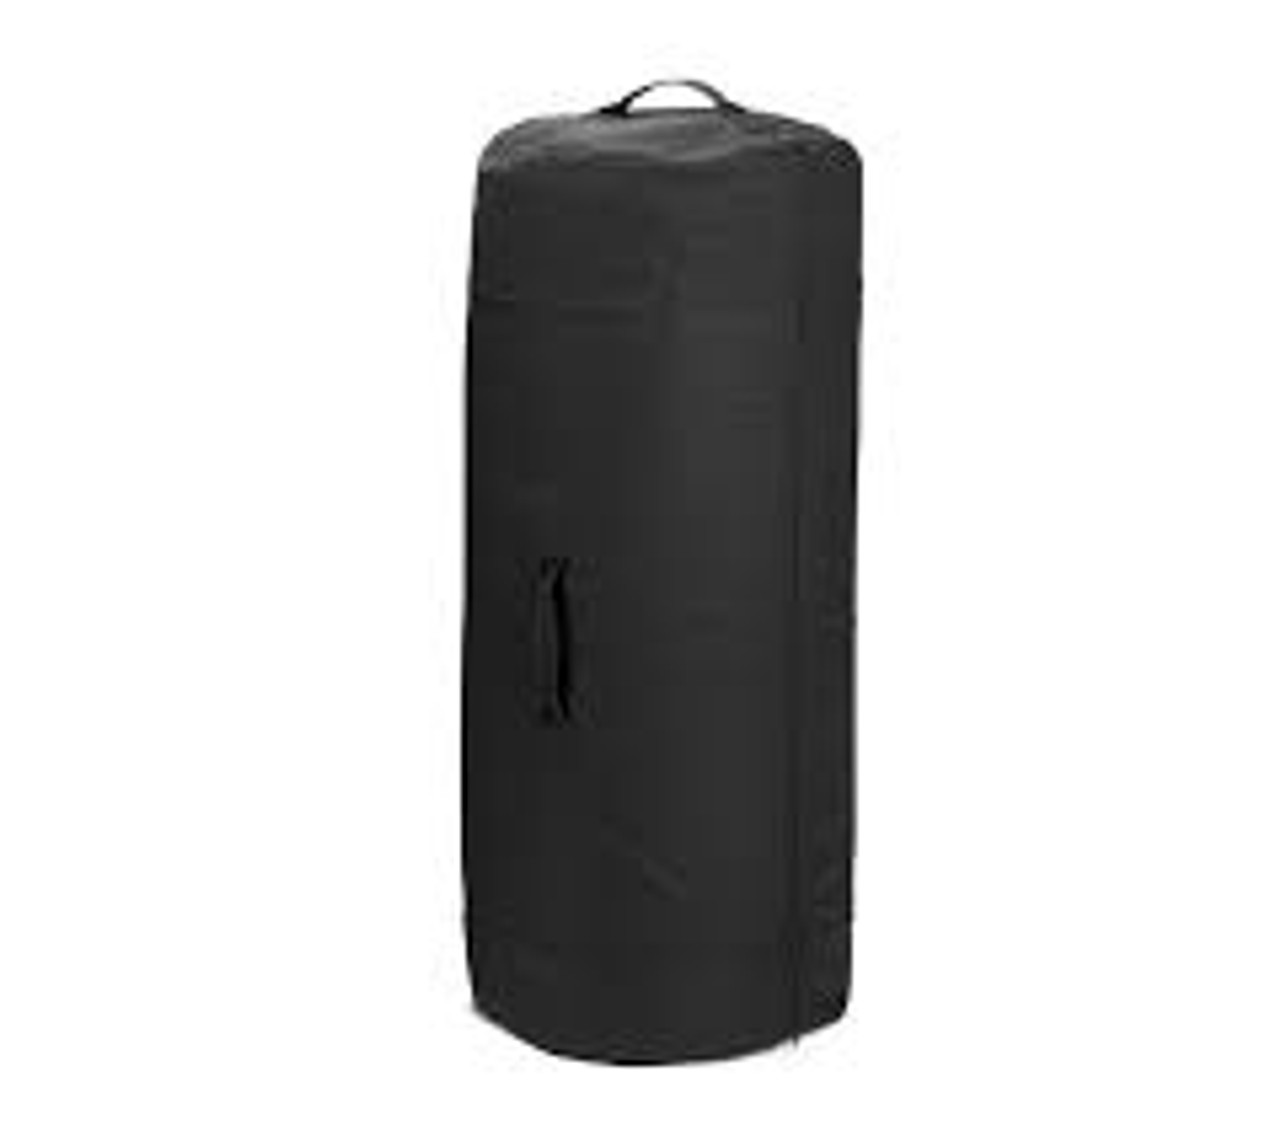 Canvas Duffle Bag With Side Zipper - 25x42 (JUMBO)